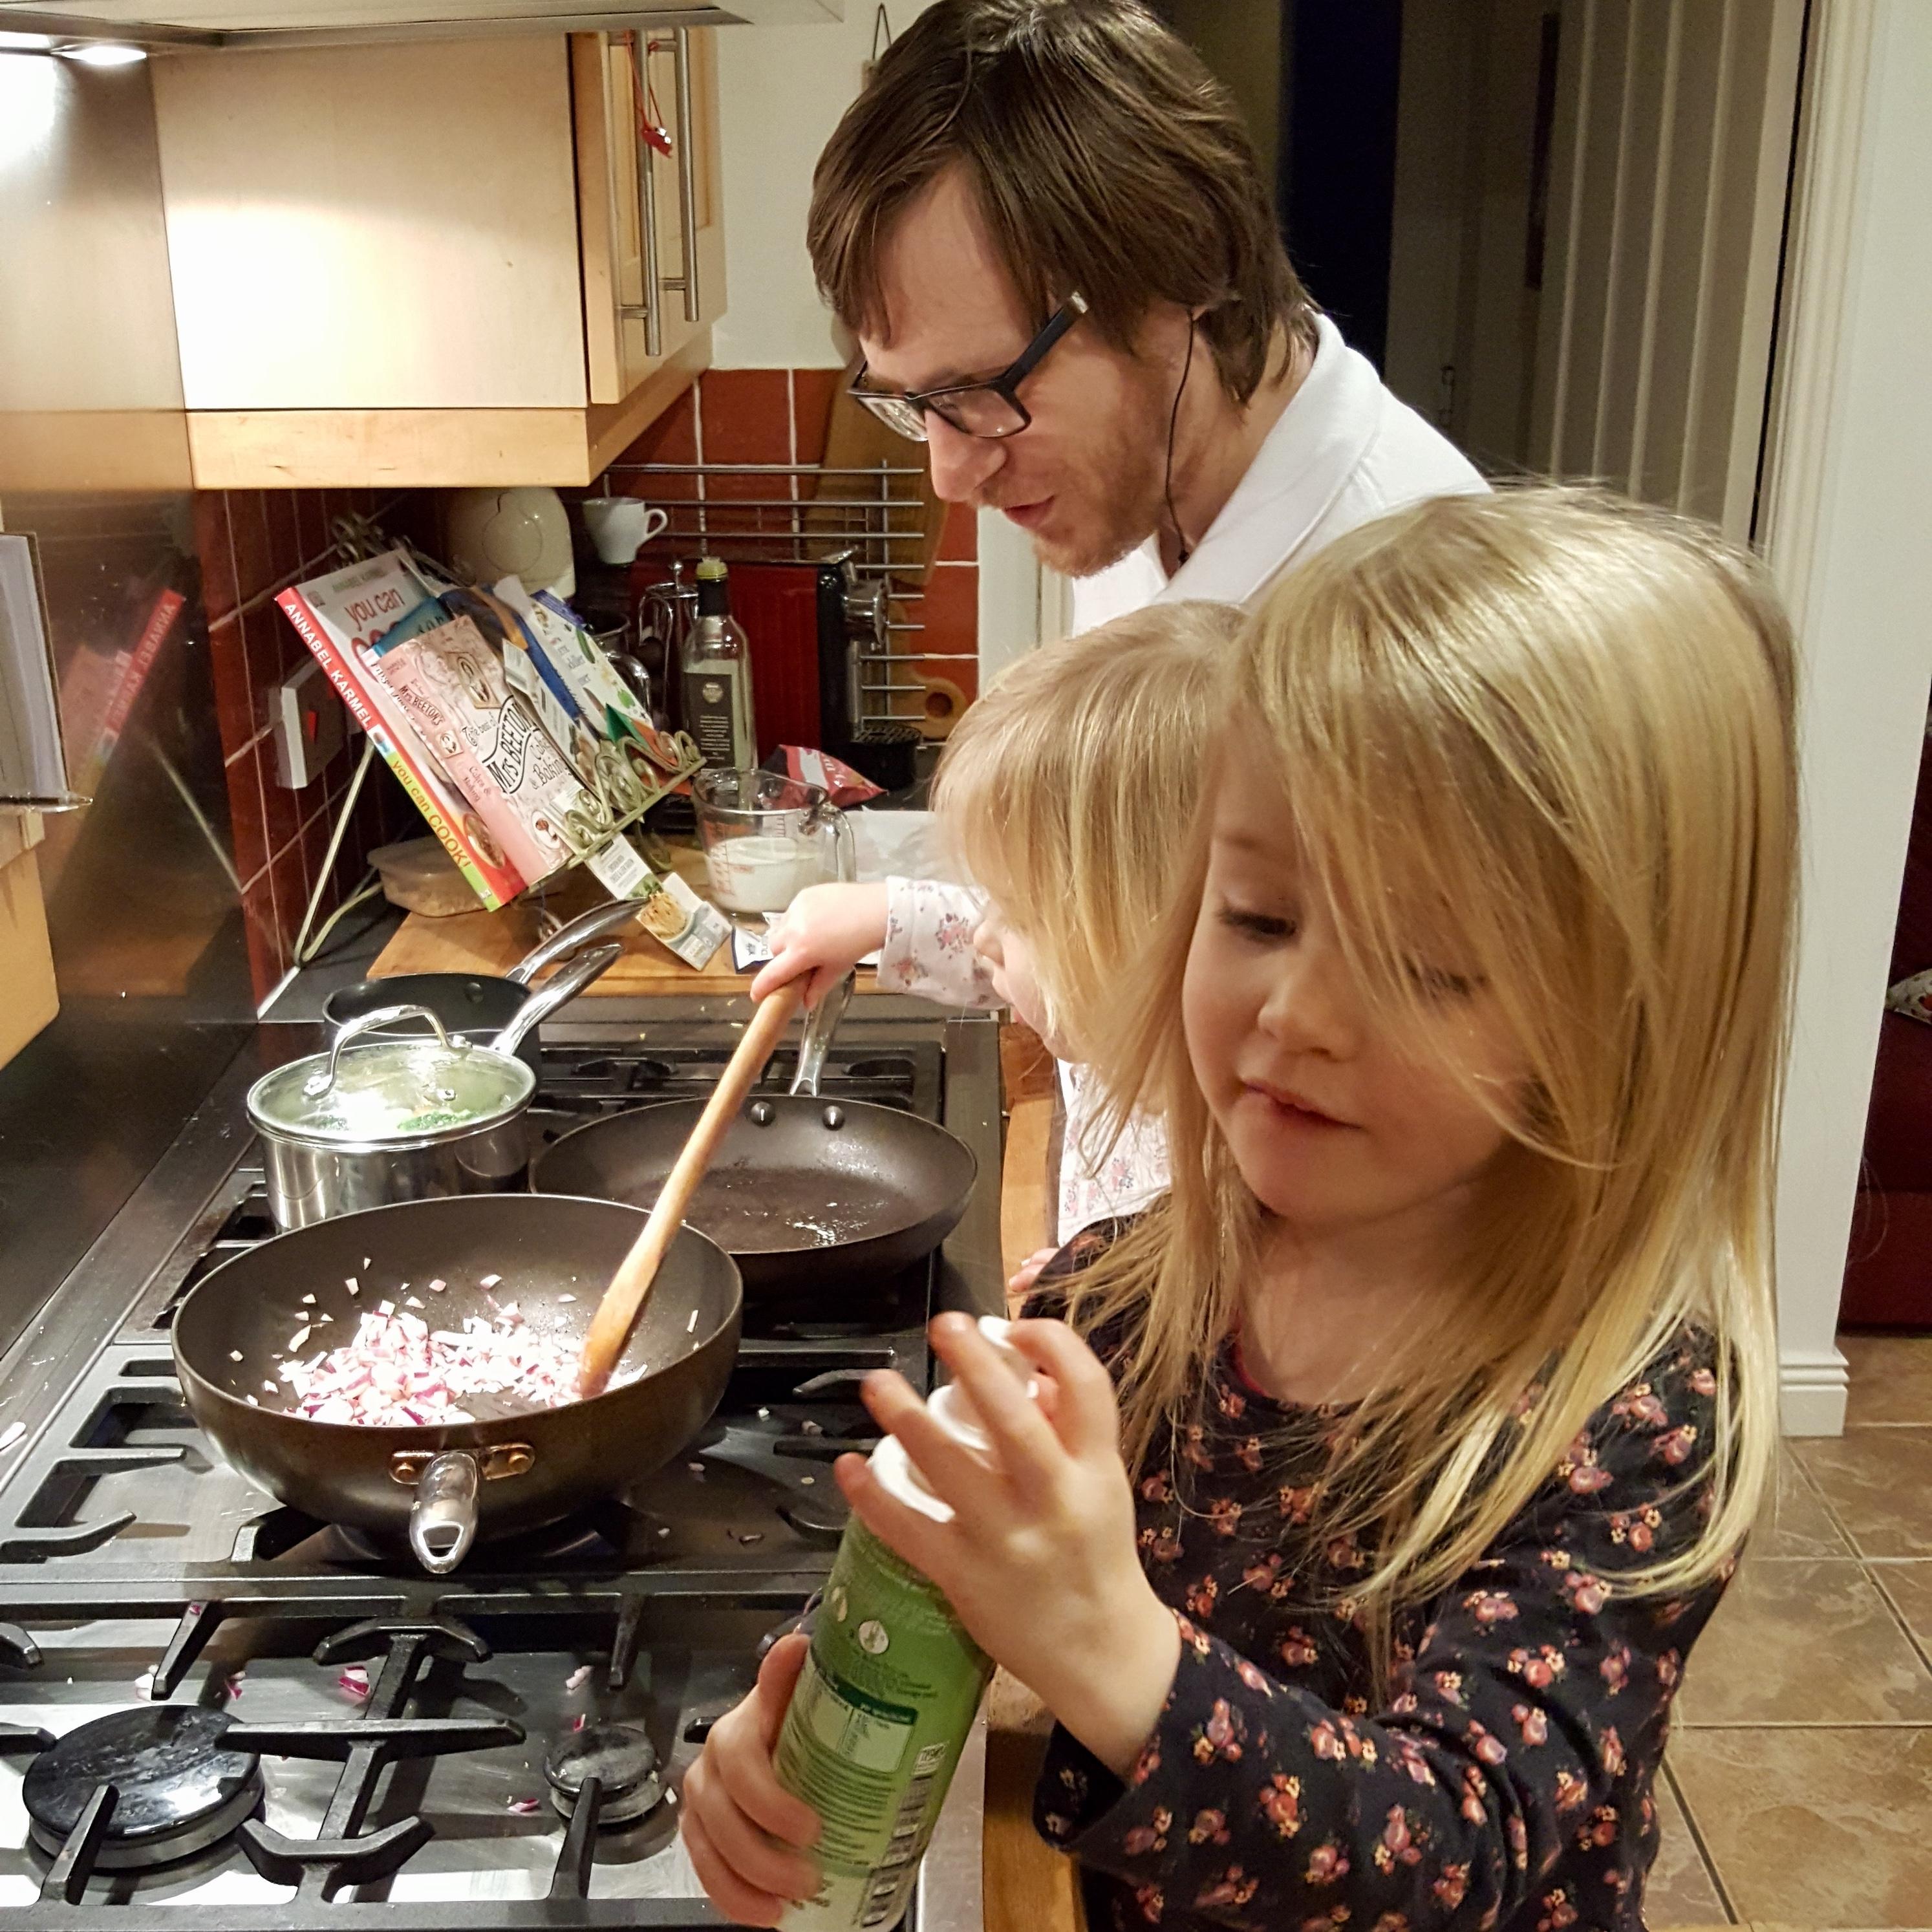 18 Preschool Chores